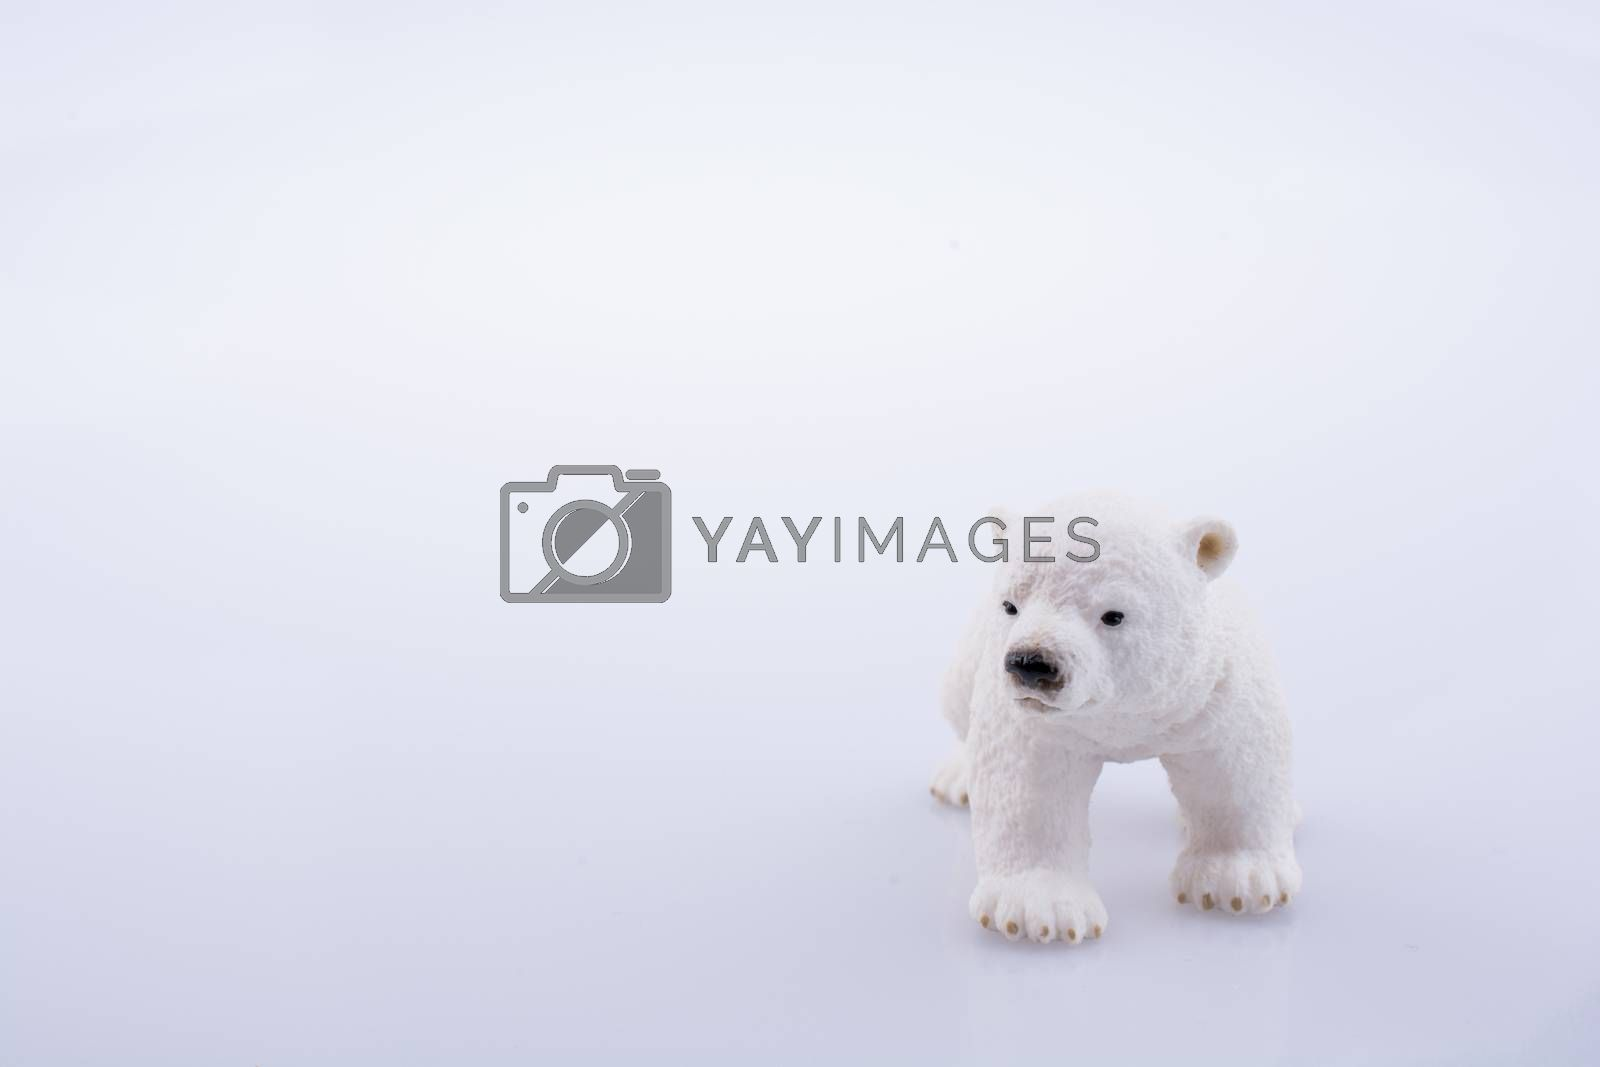 Polar bear model on a white background